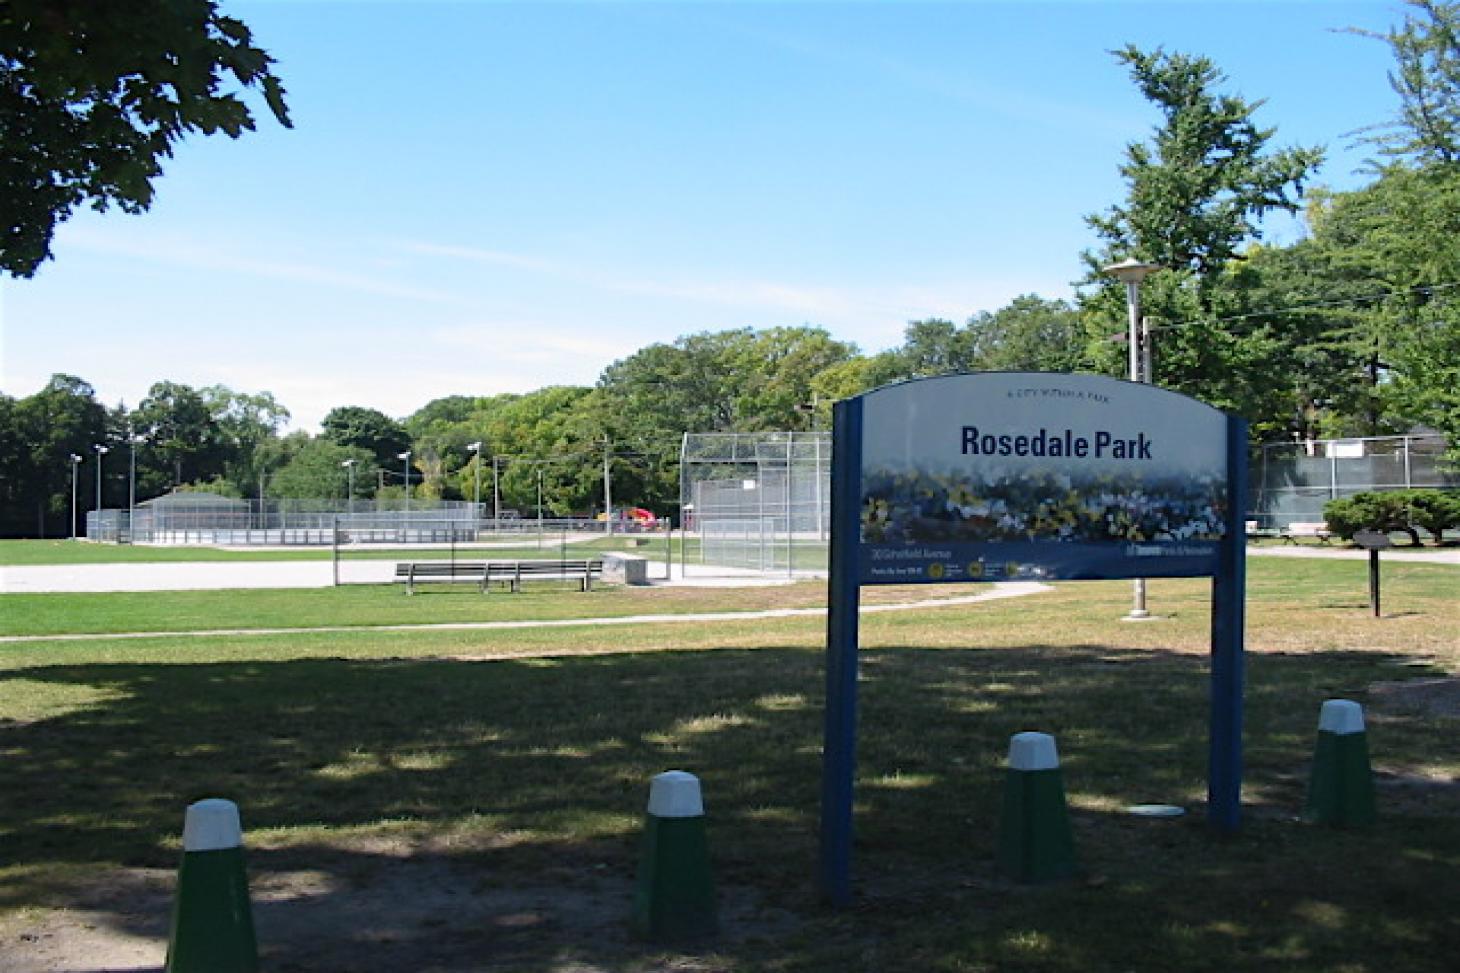 Rosedale Park Outdoor   Hard (macadam) tennis court